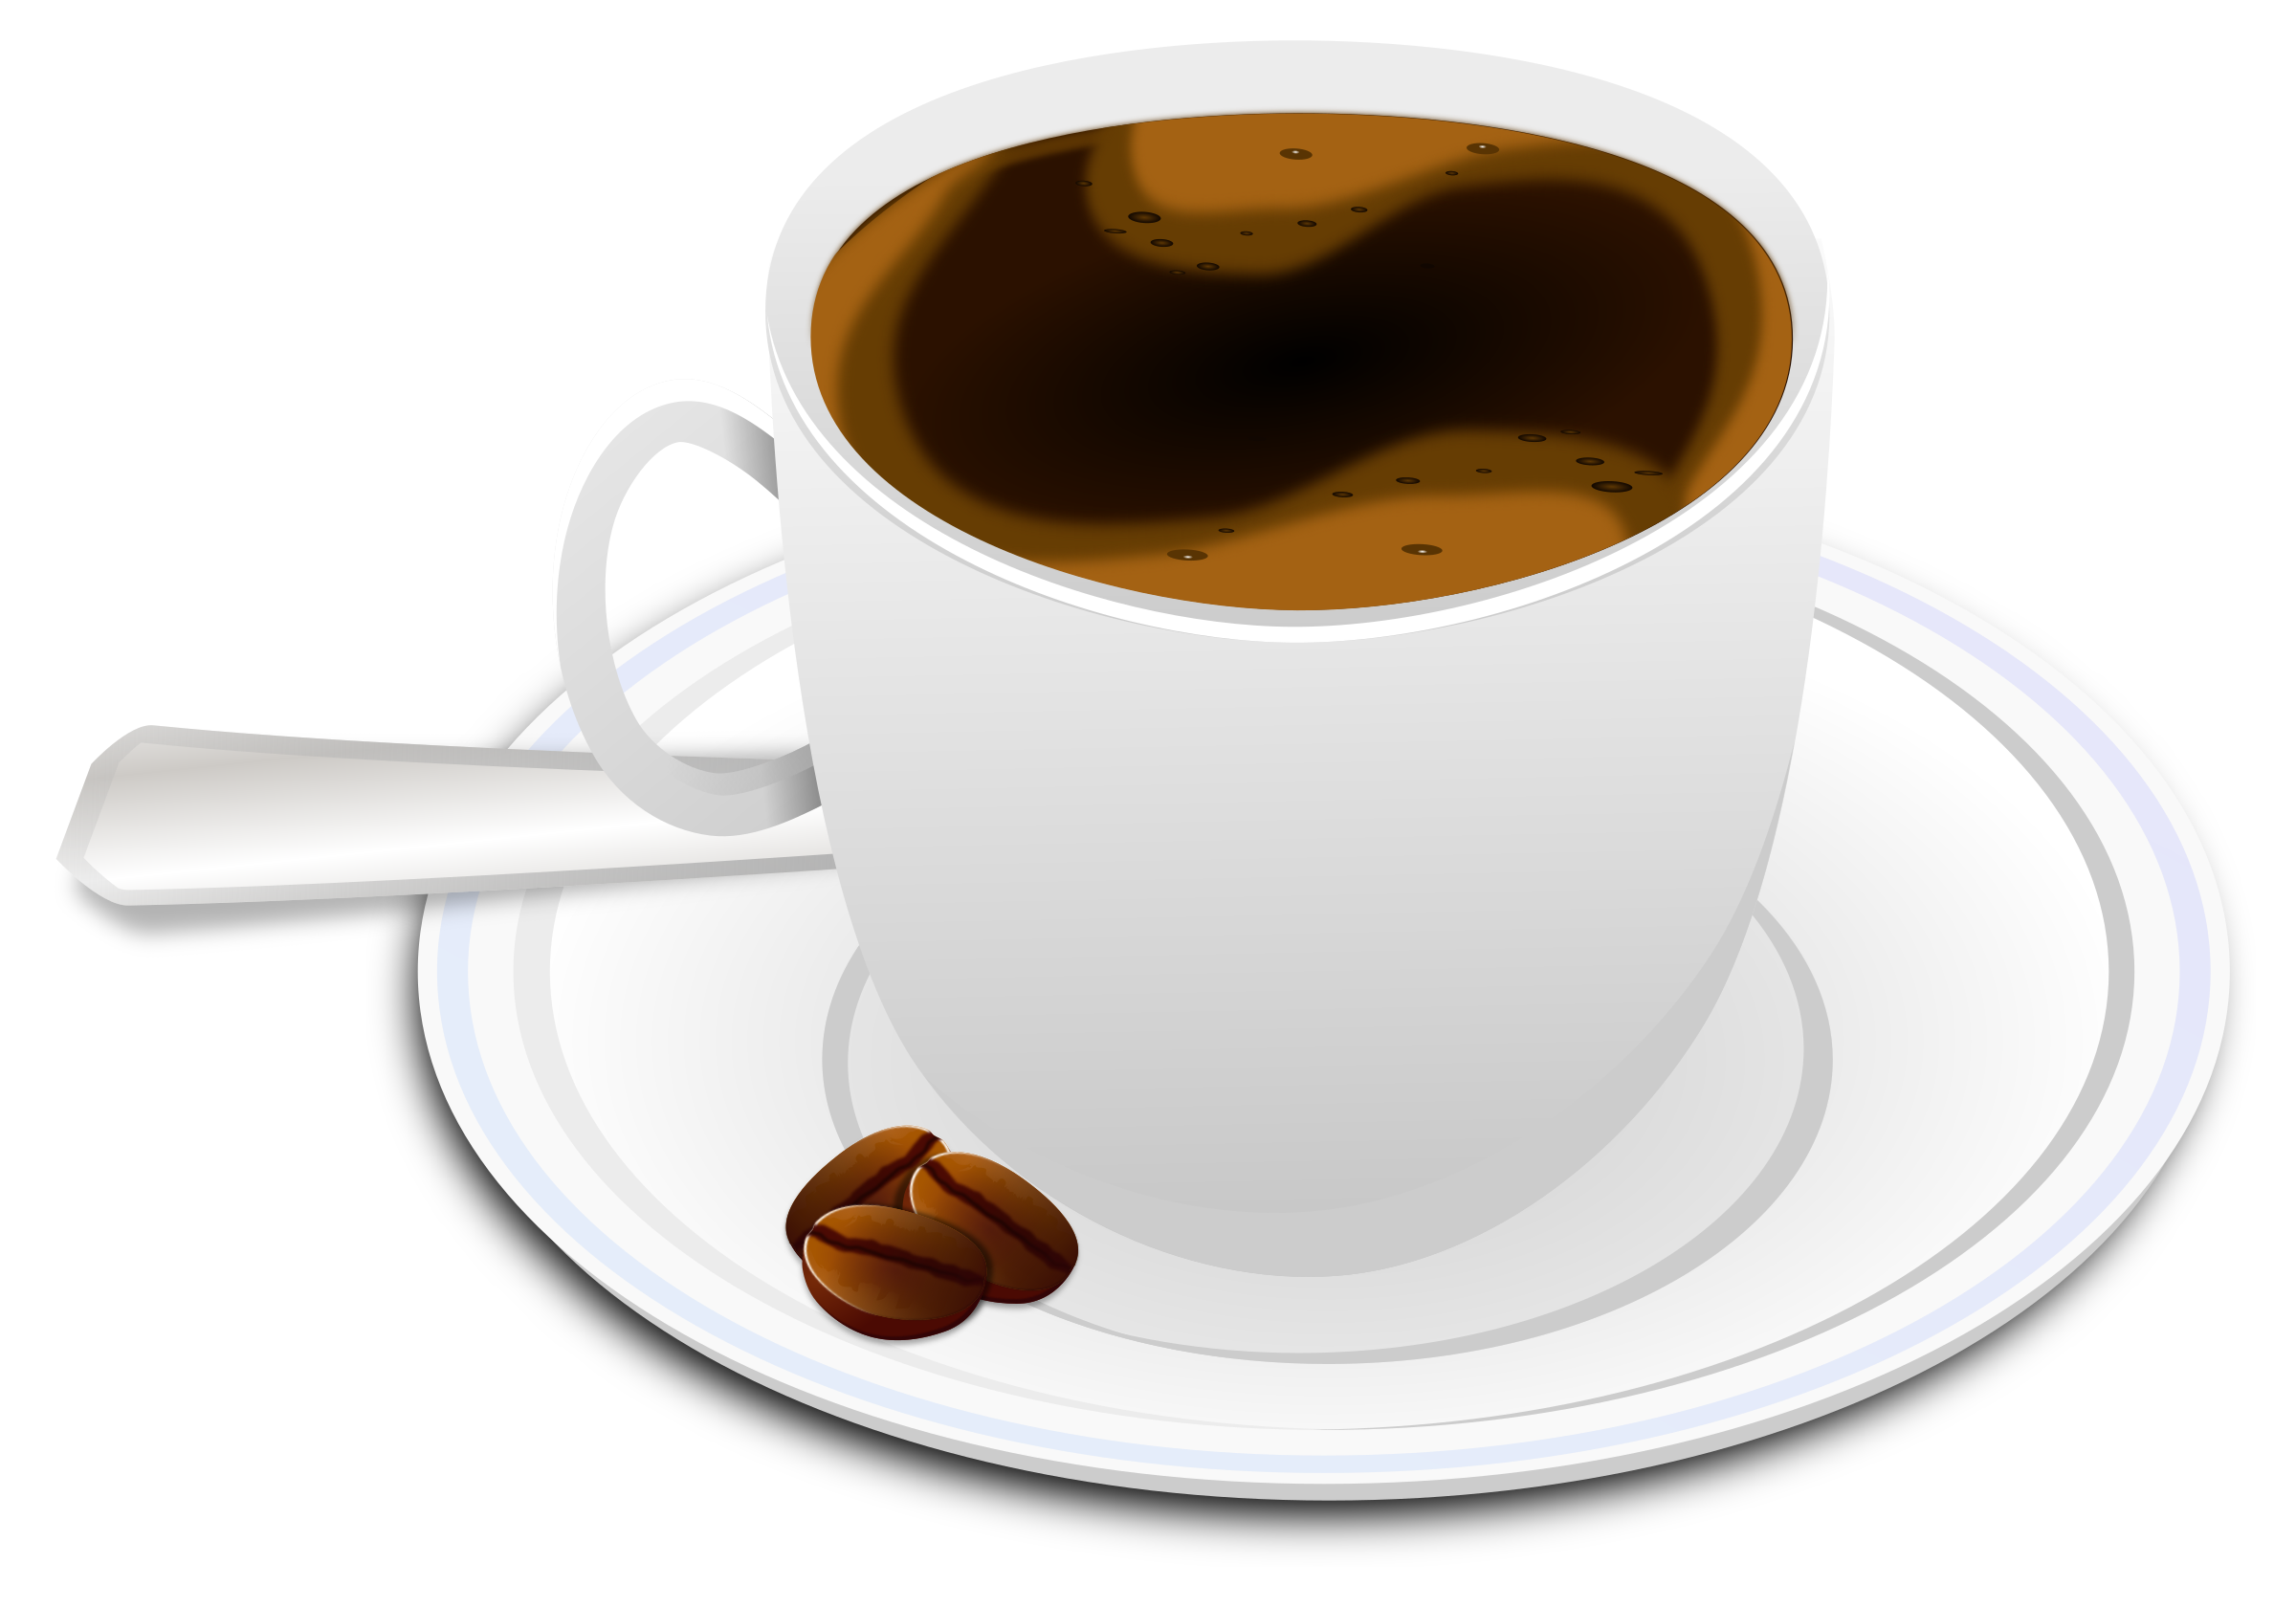 Coffee espresso clipart jpg royalty free library Espresso Clipart - Clip Art Library jpg royalty free library